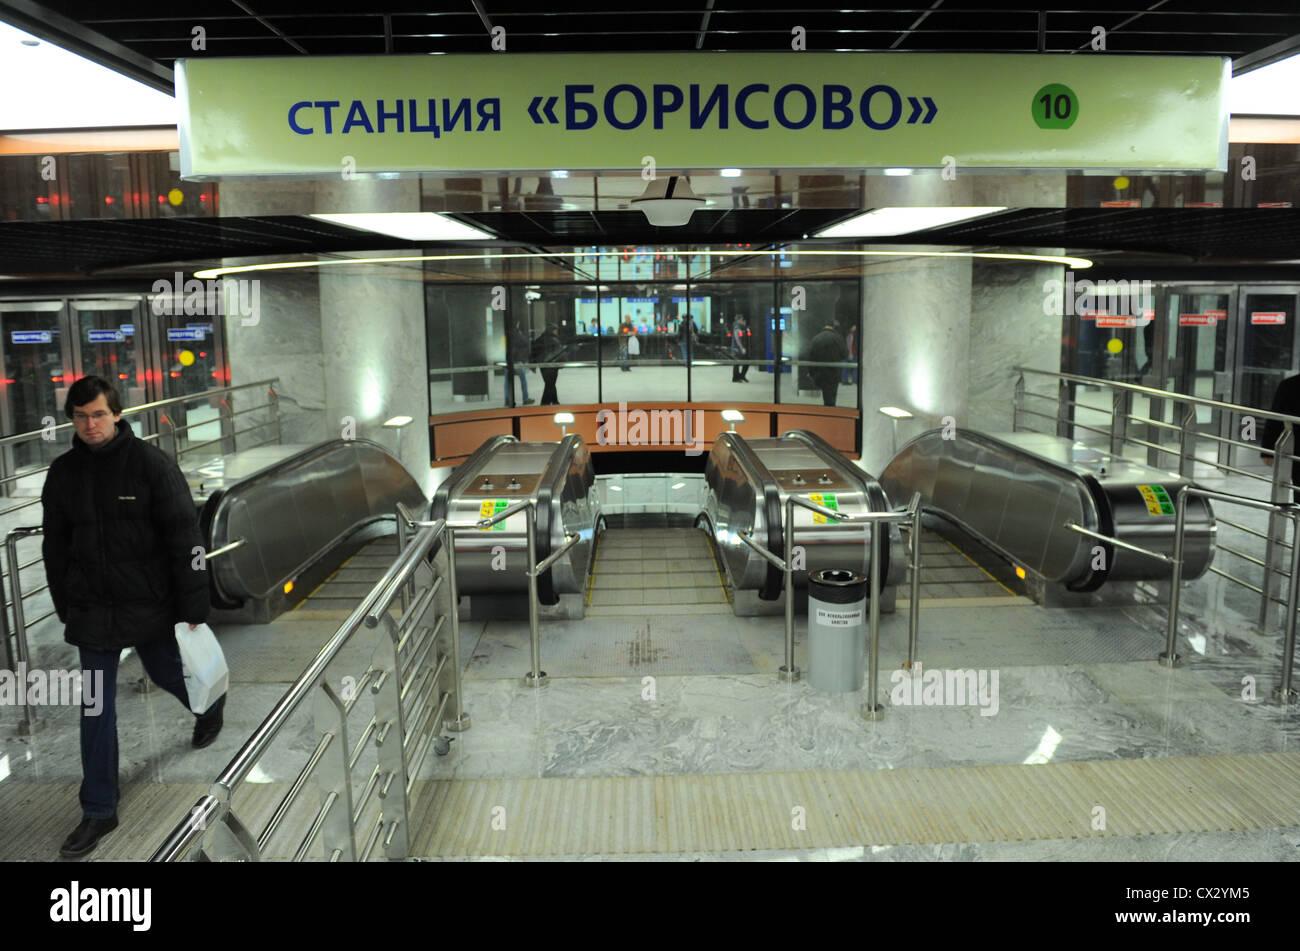 MOSCOW, RUSSIA. DECEMBER 2, 2011. Entrance to the newly opened Borisovo metro station. (Photo ITAR-TASS / Mitya - Stock Image